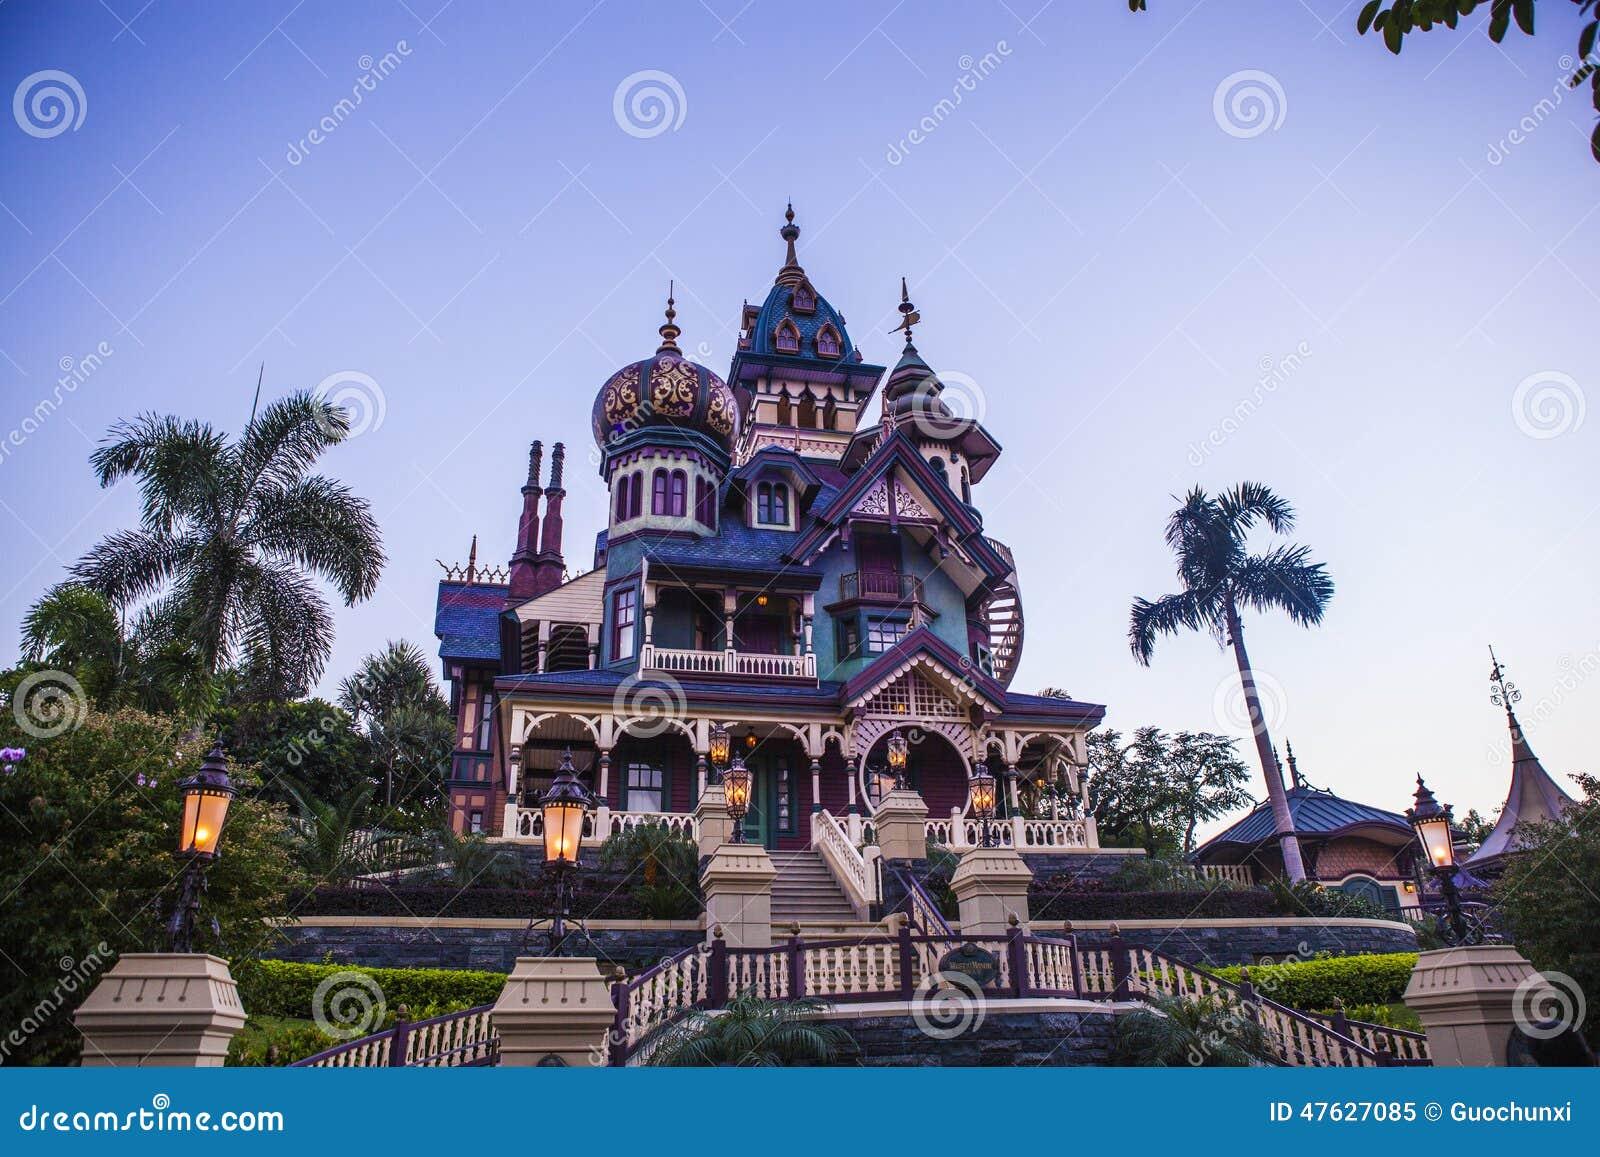 Mickey s toontown i Disneyland